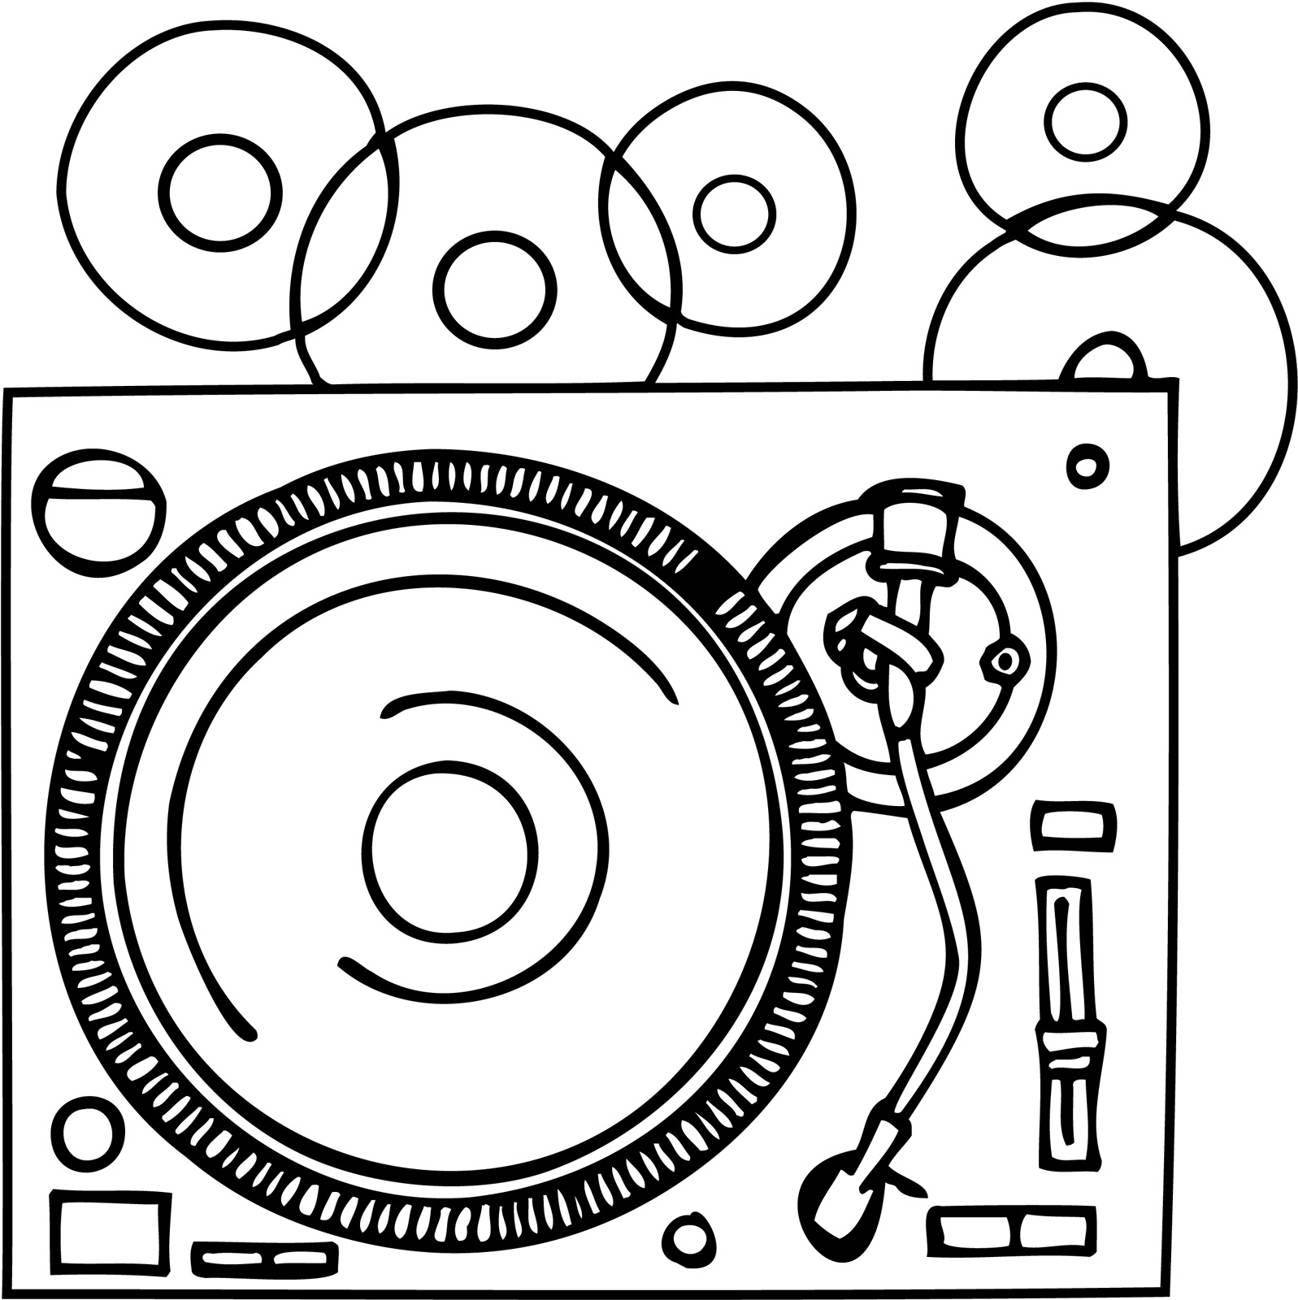 MUSIC-092